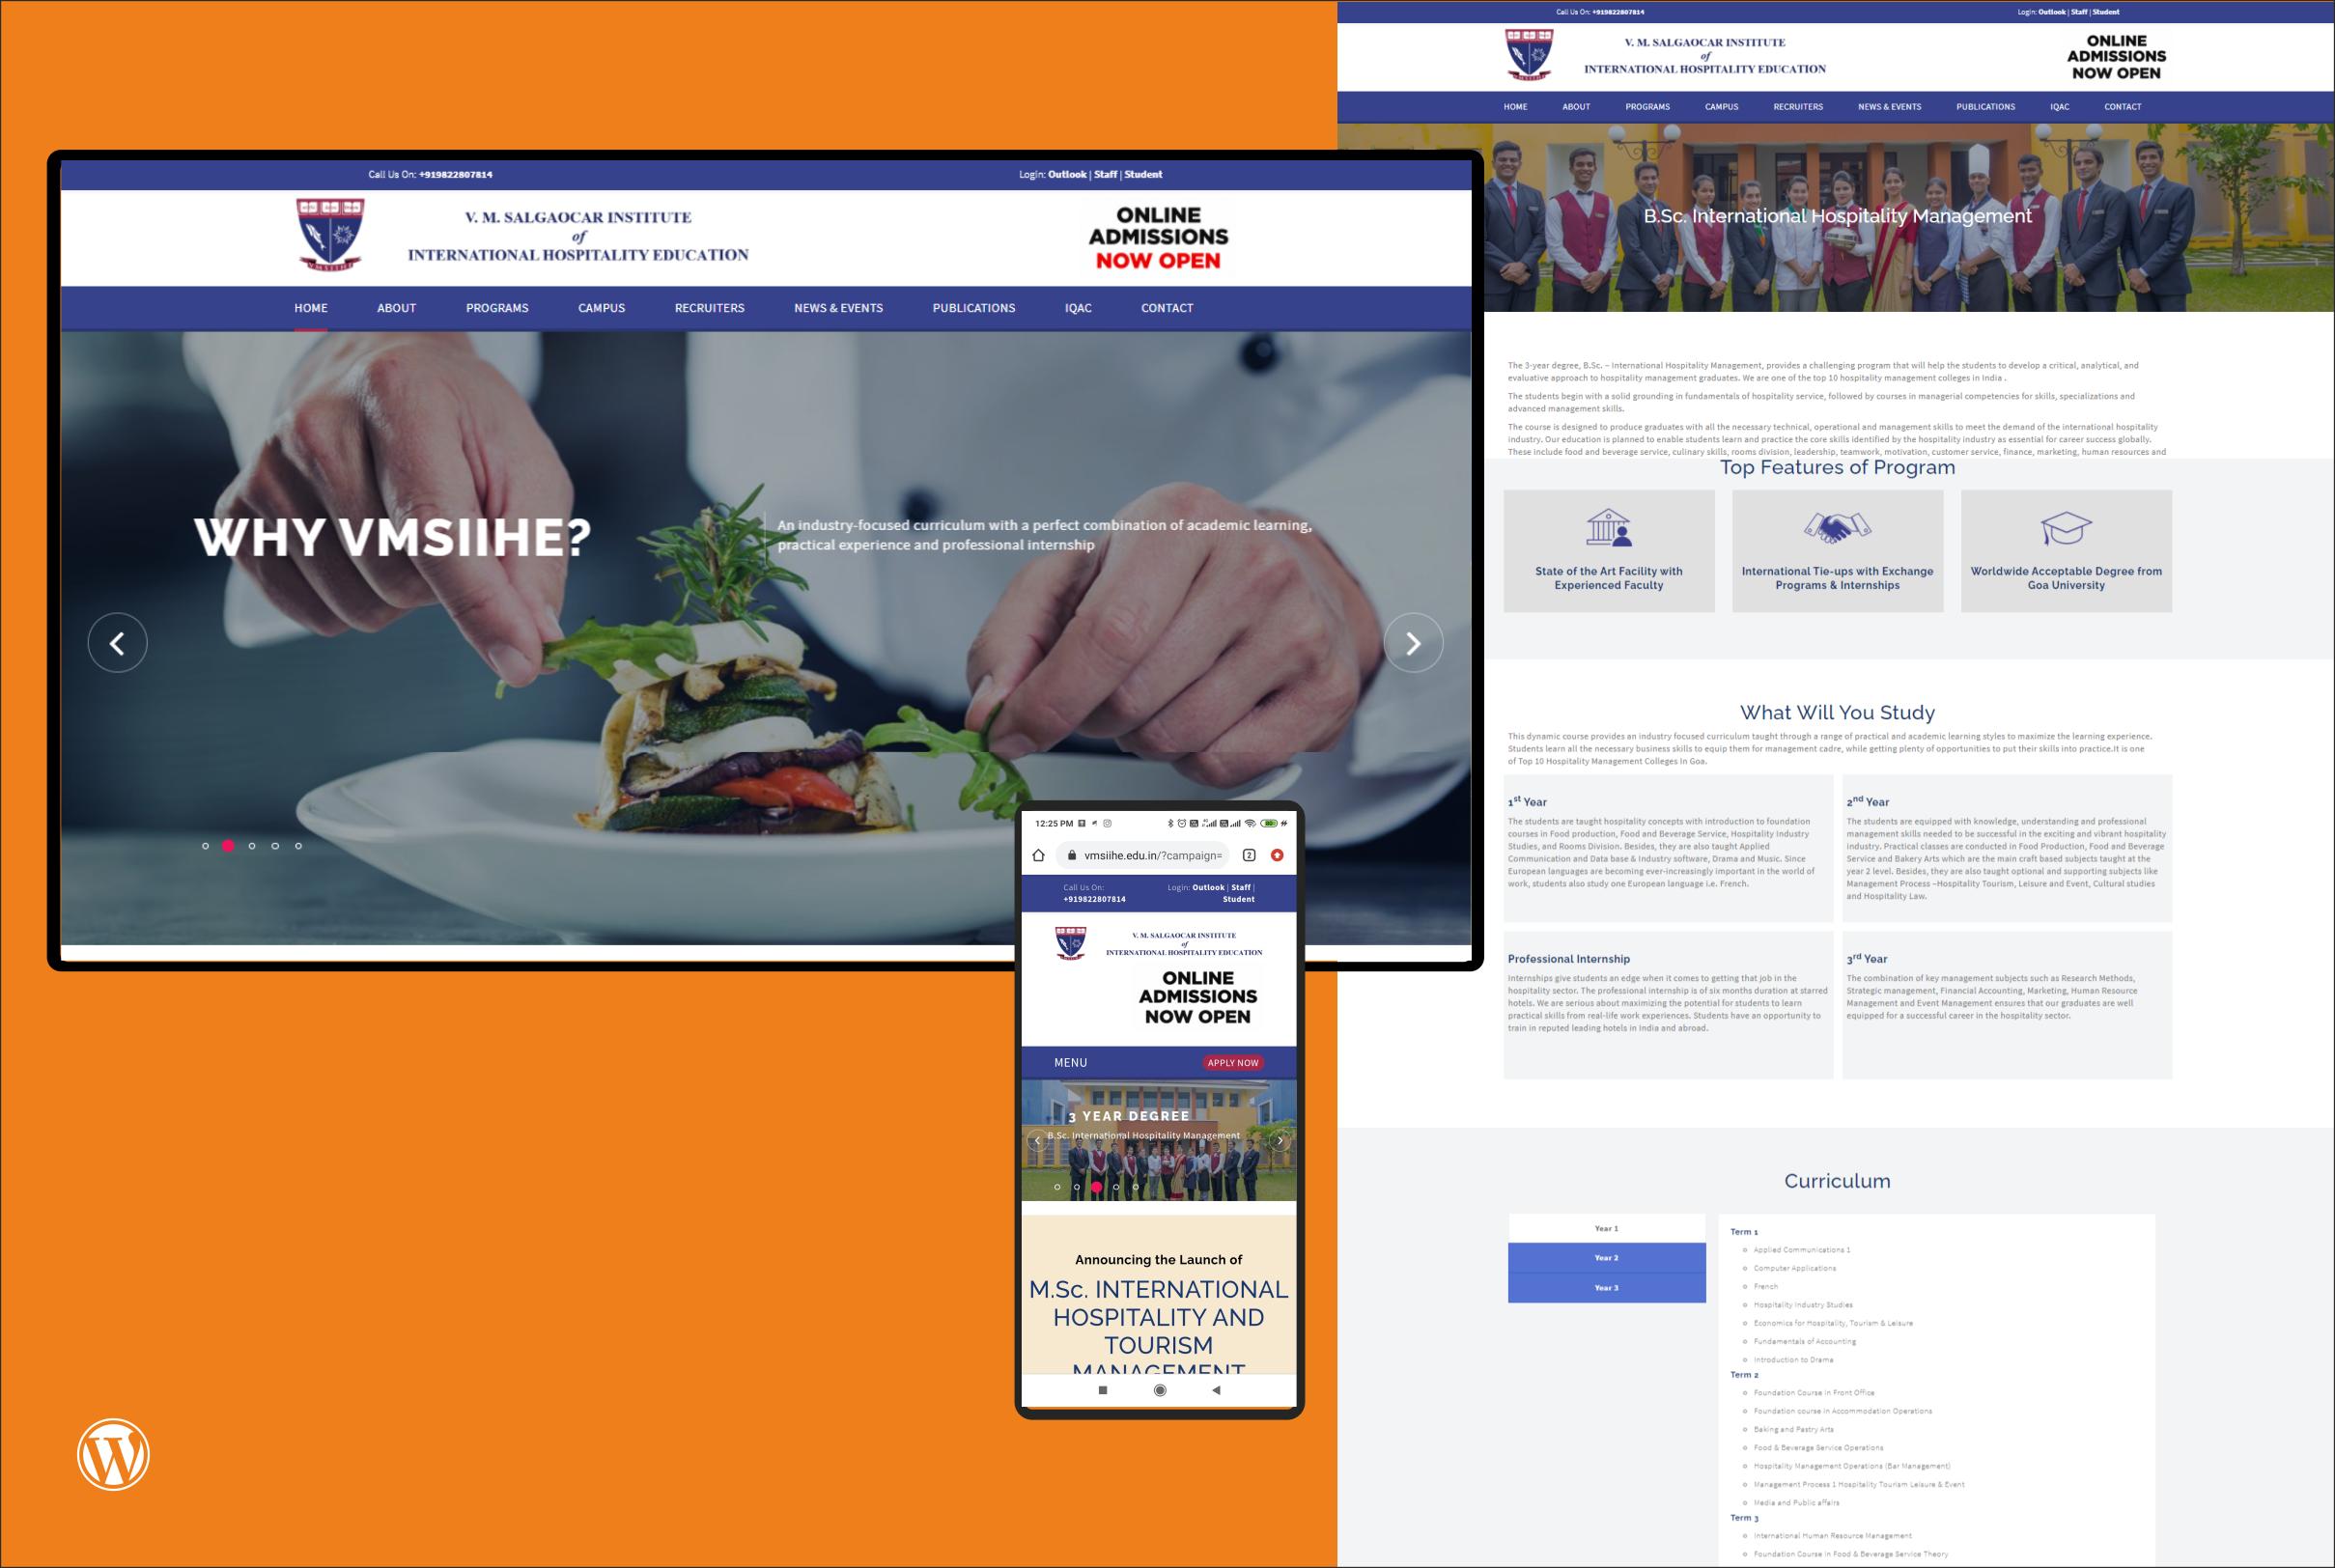 VMSIIHE Website Design